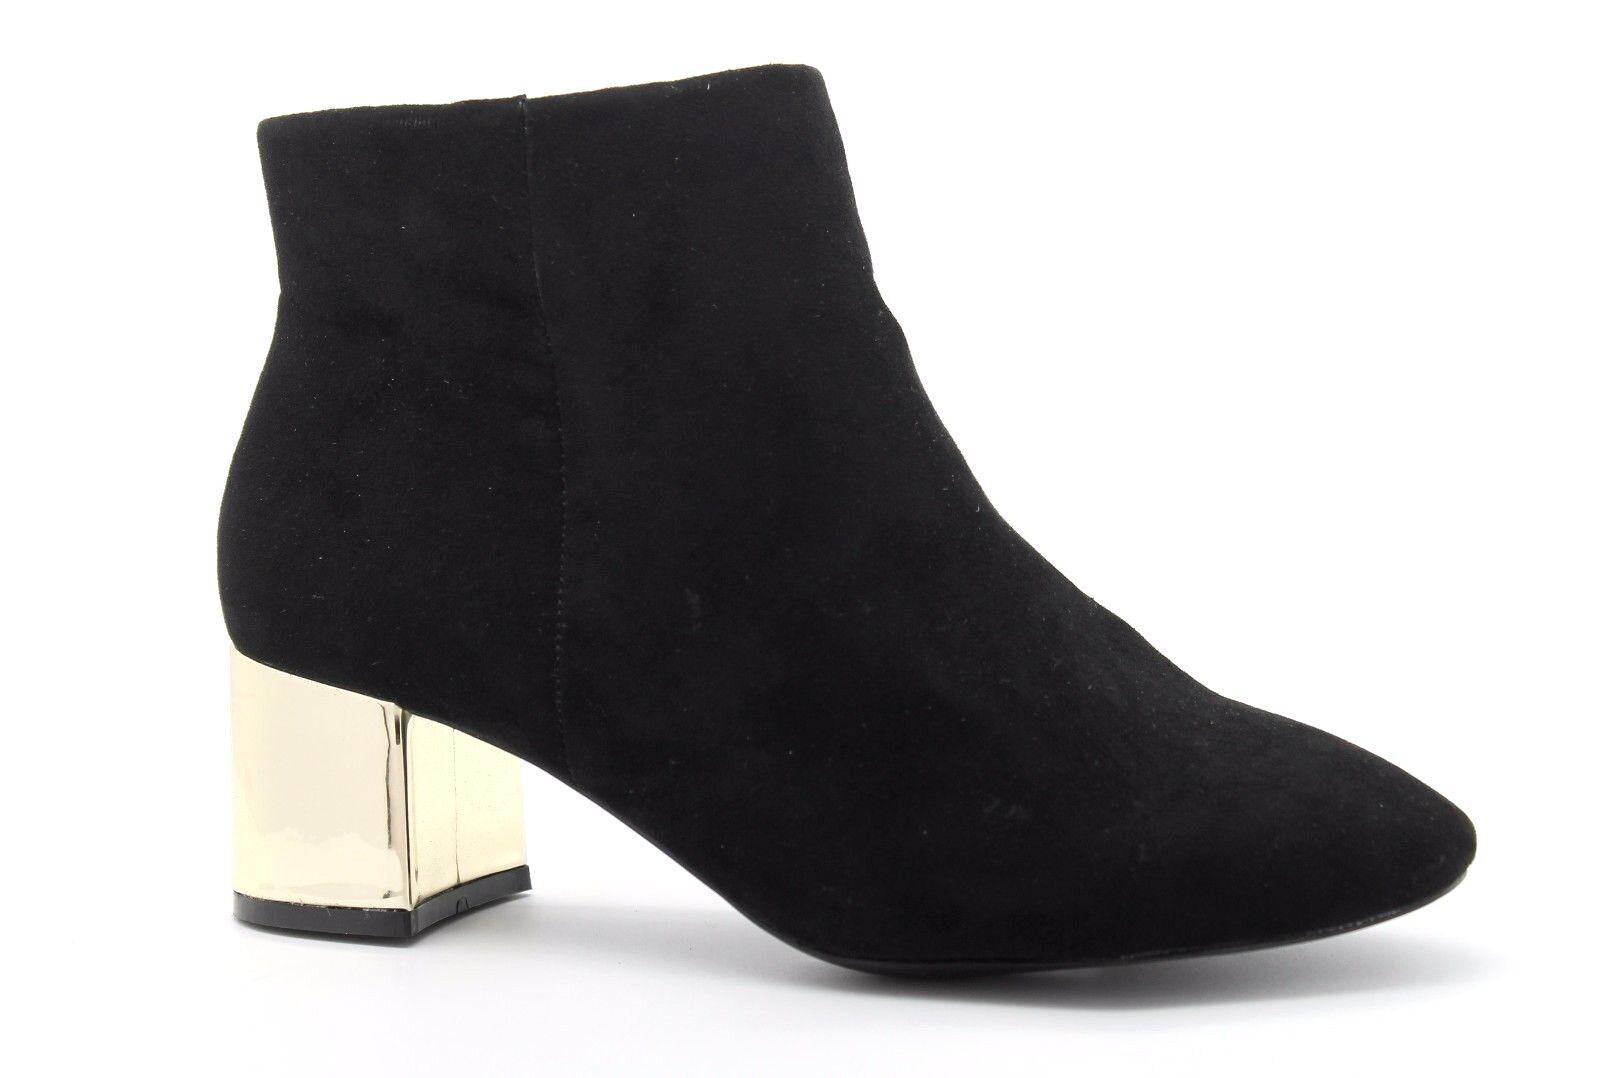 Evans Mujer Reino Unido 6 EEE Extra Ancho aisla Negro Imitación Gamuza botas al Tobillo Bloque Talón